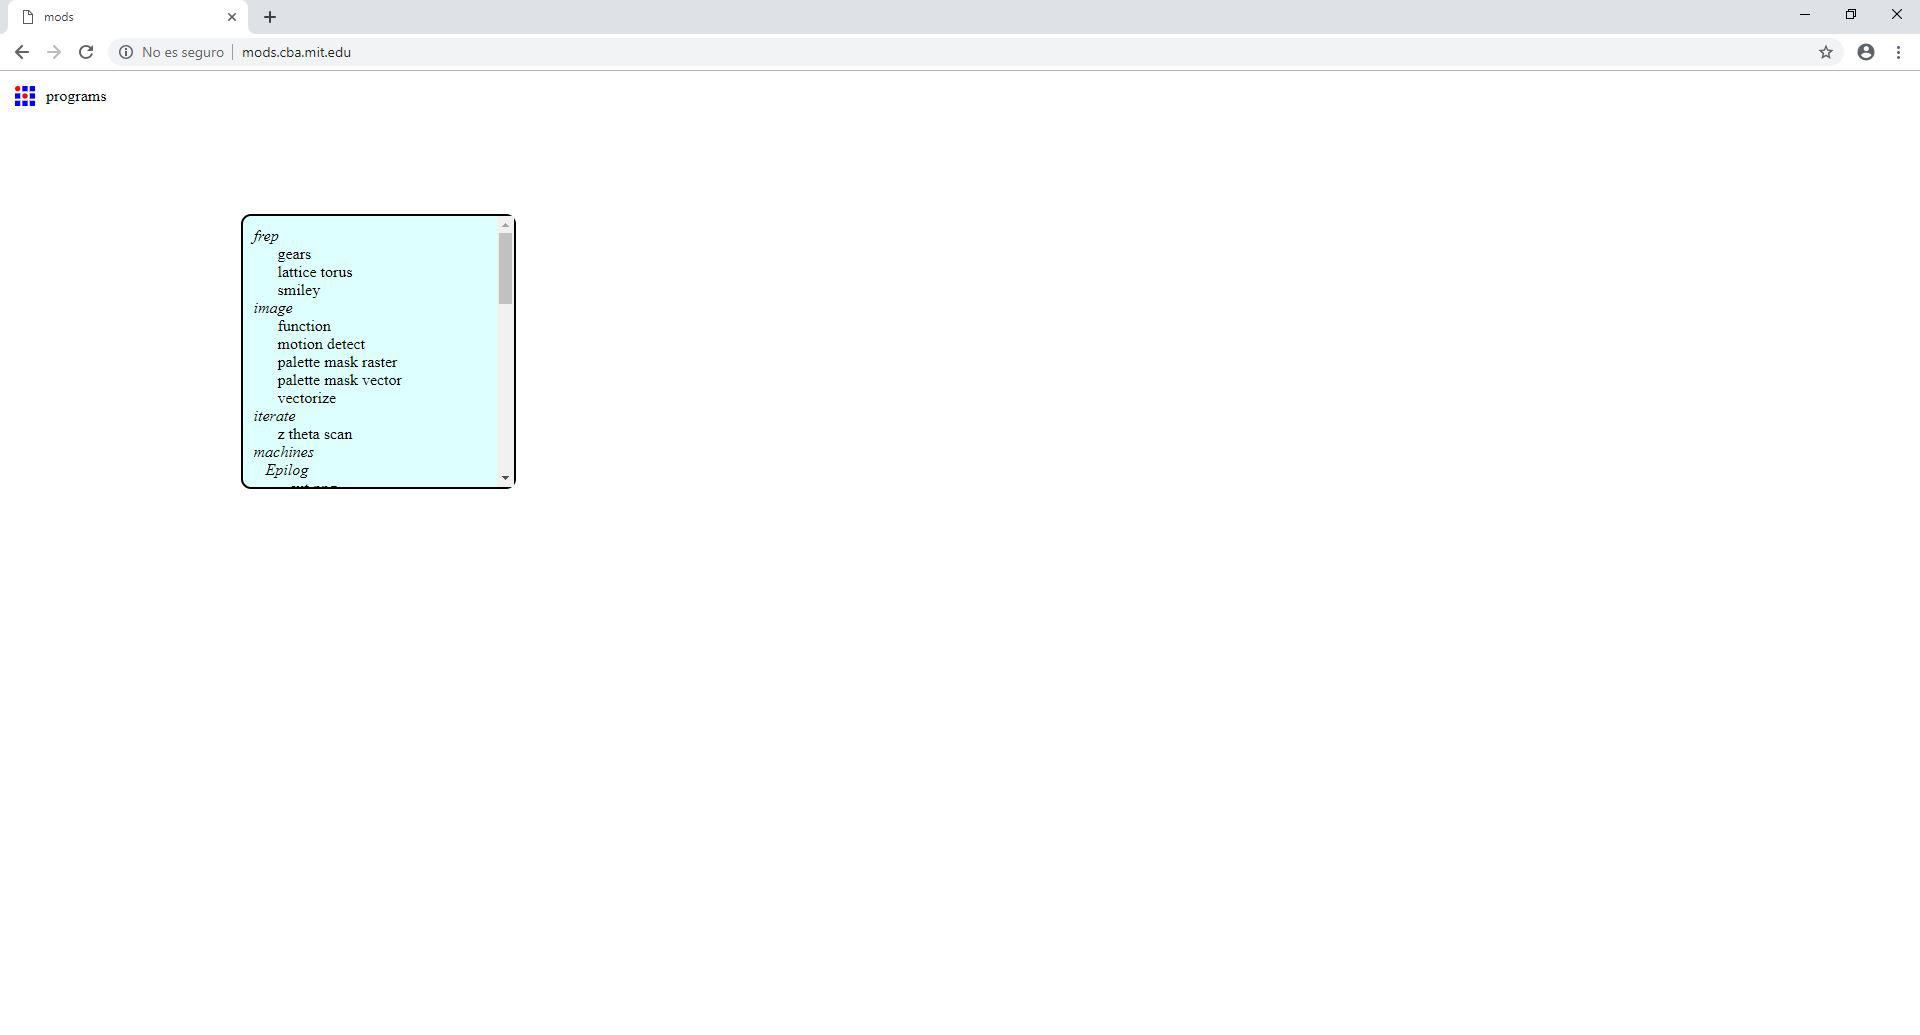 week04_electronic_production/mods/2.jpg